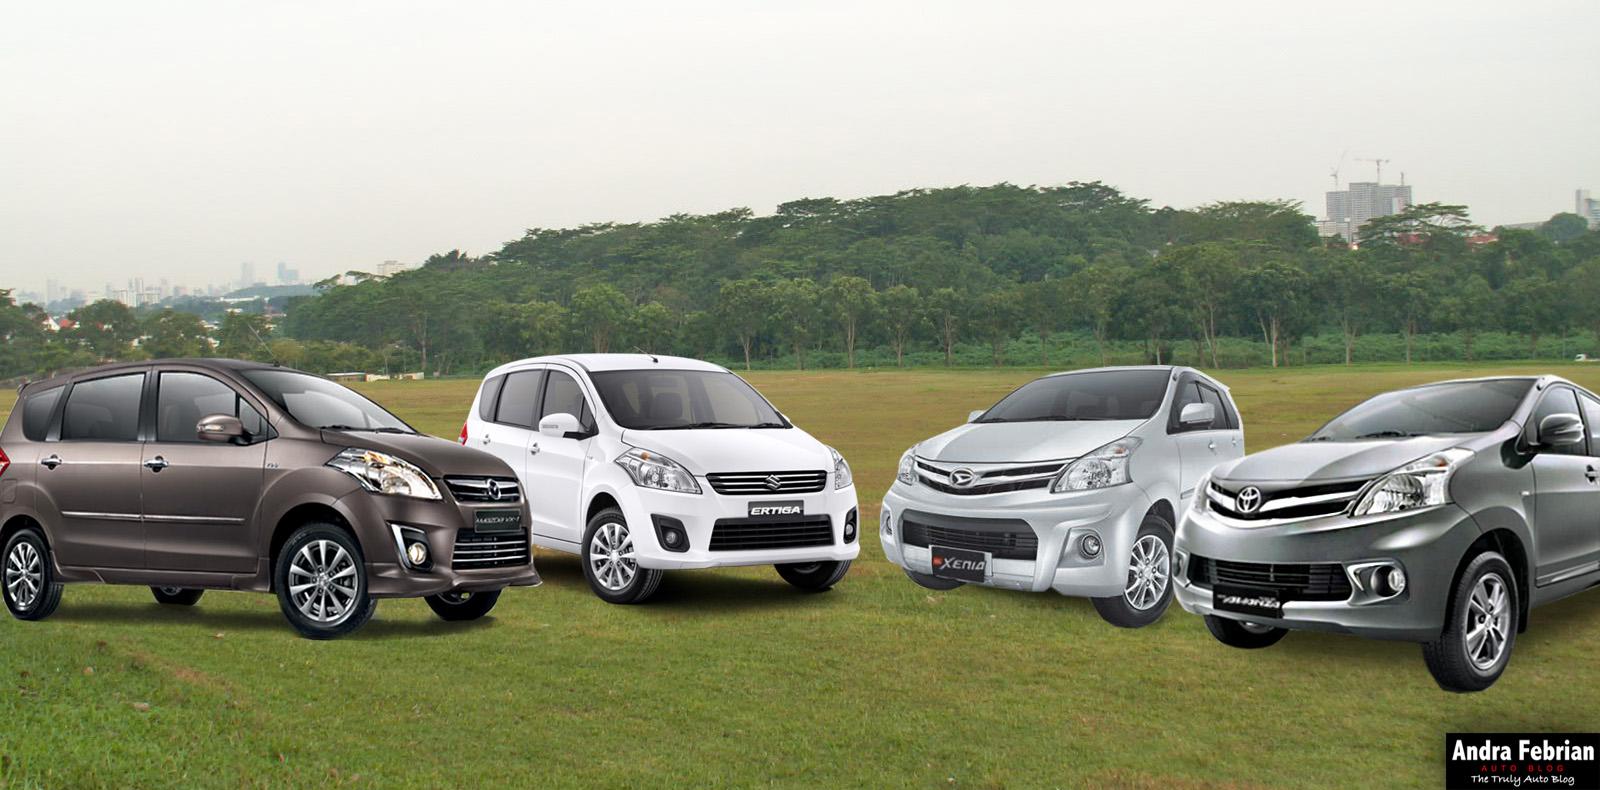 Grand New Avanza Vs Toyota Yaris Trd Parts Menang Mana Ertiga Vx 1 Atau Xenia Andra